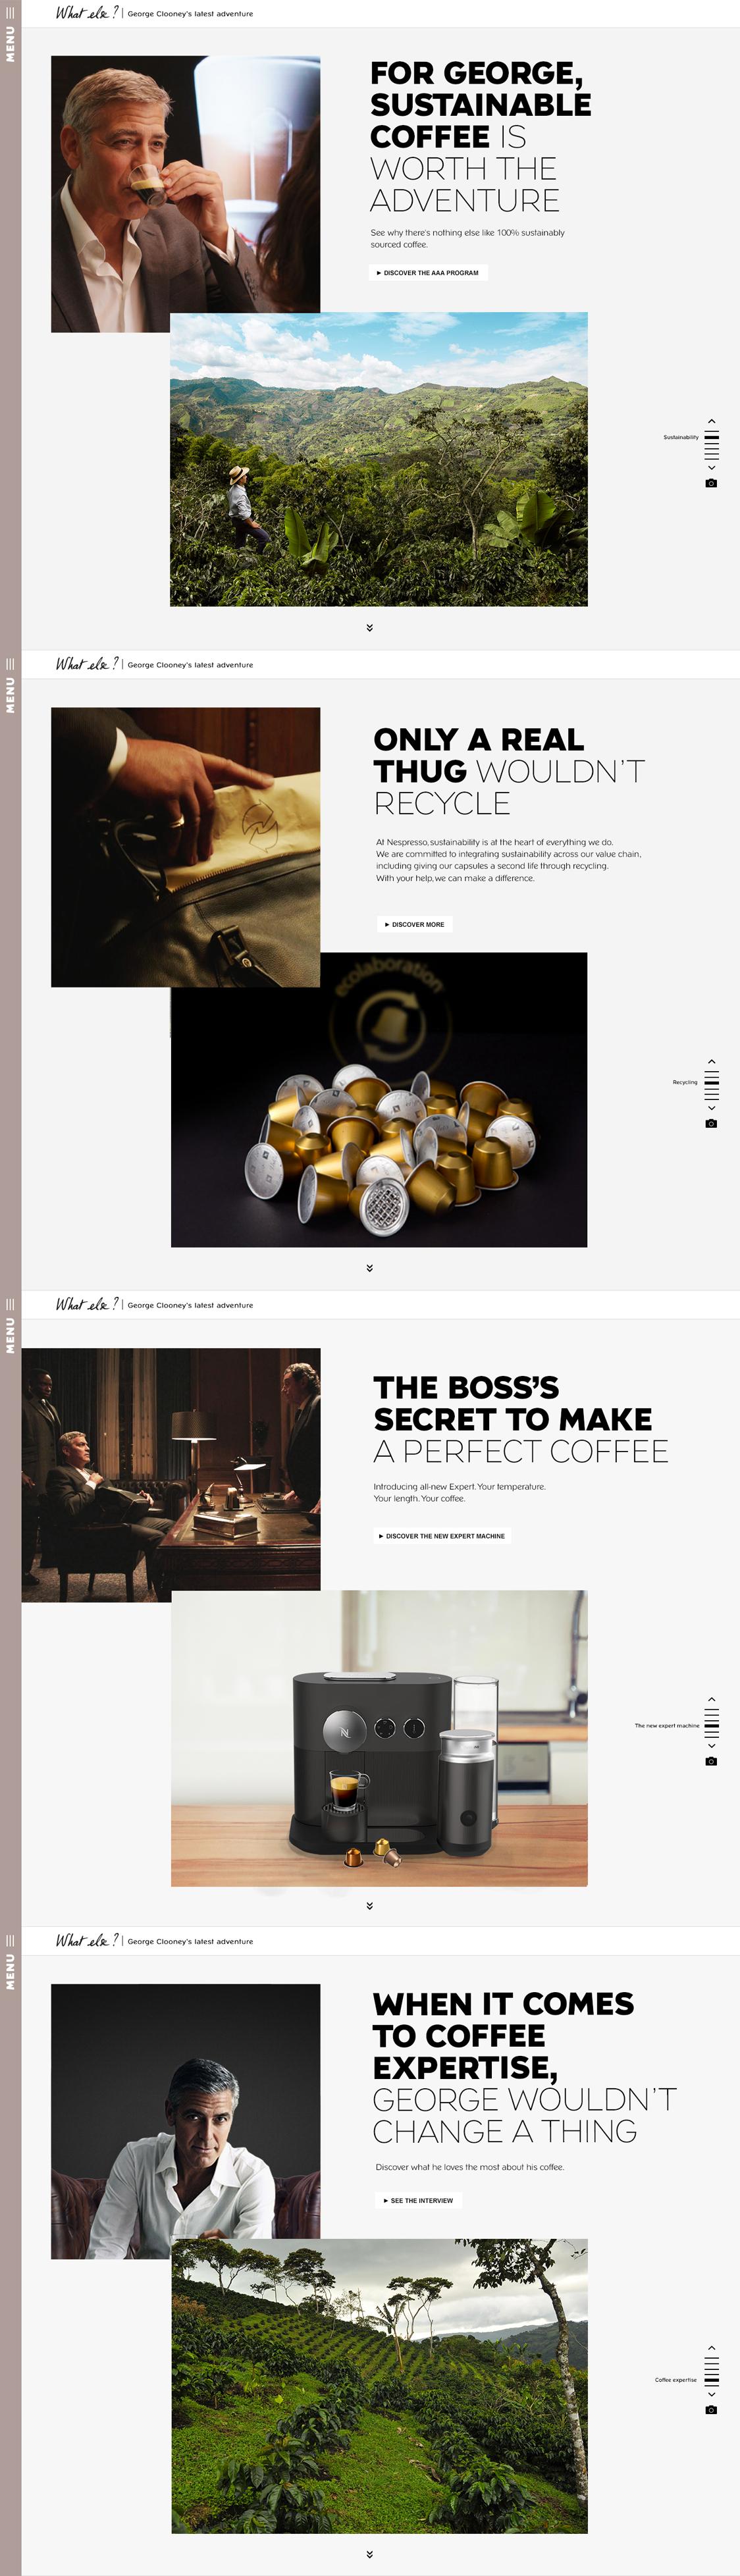 nespresso_changenothing03